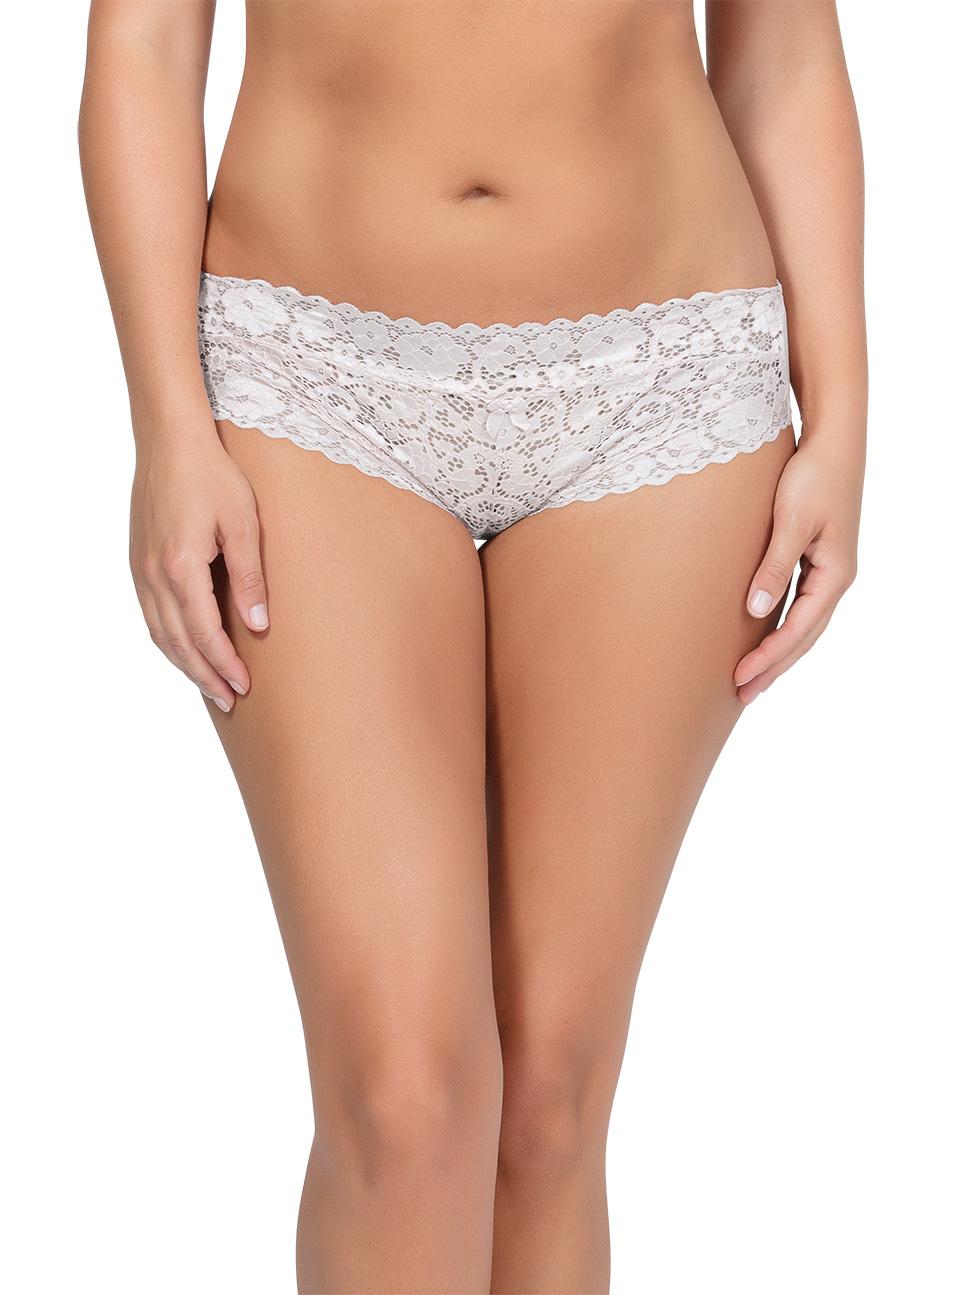 PARFAIT Adriana BikiniP5483 PearlWhite Front - Adriana Bikini - Pearl White - P5483